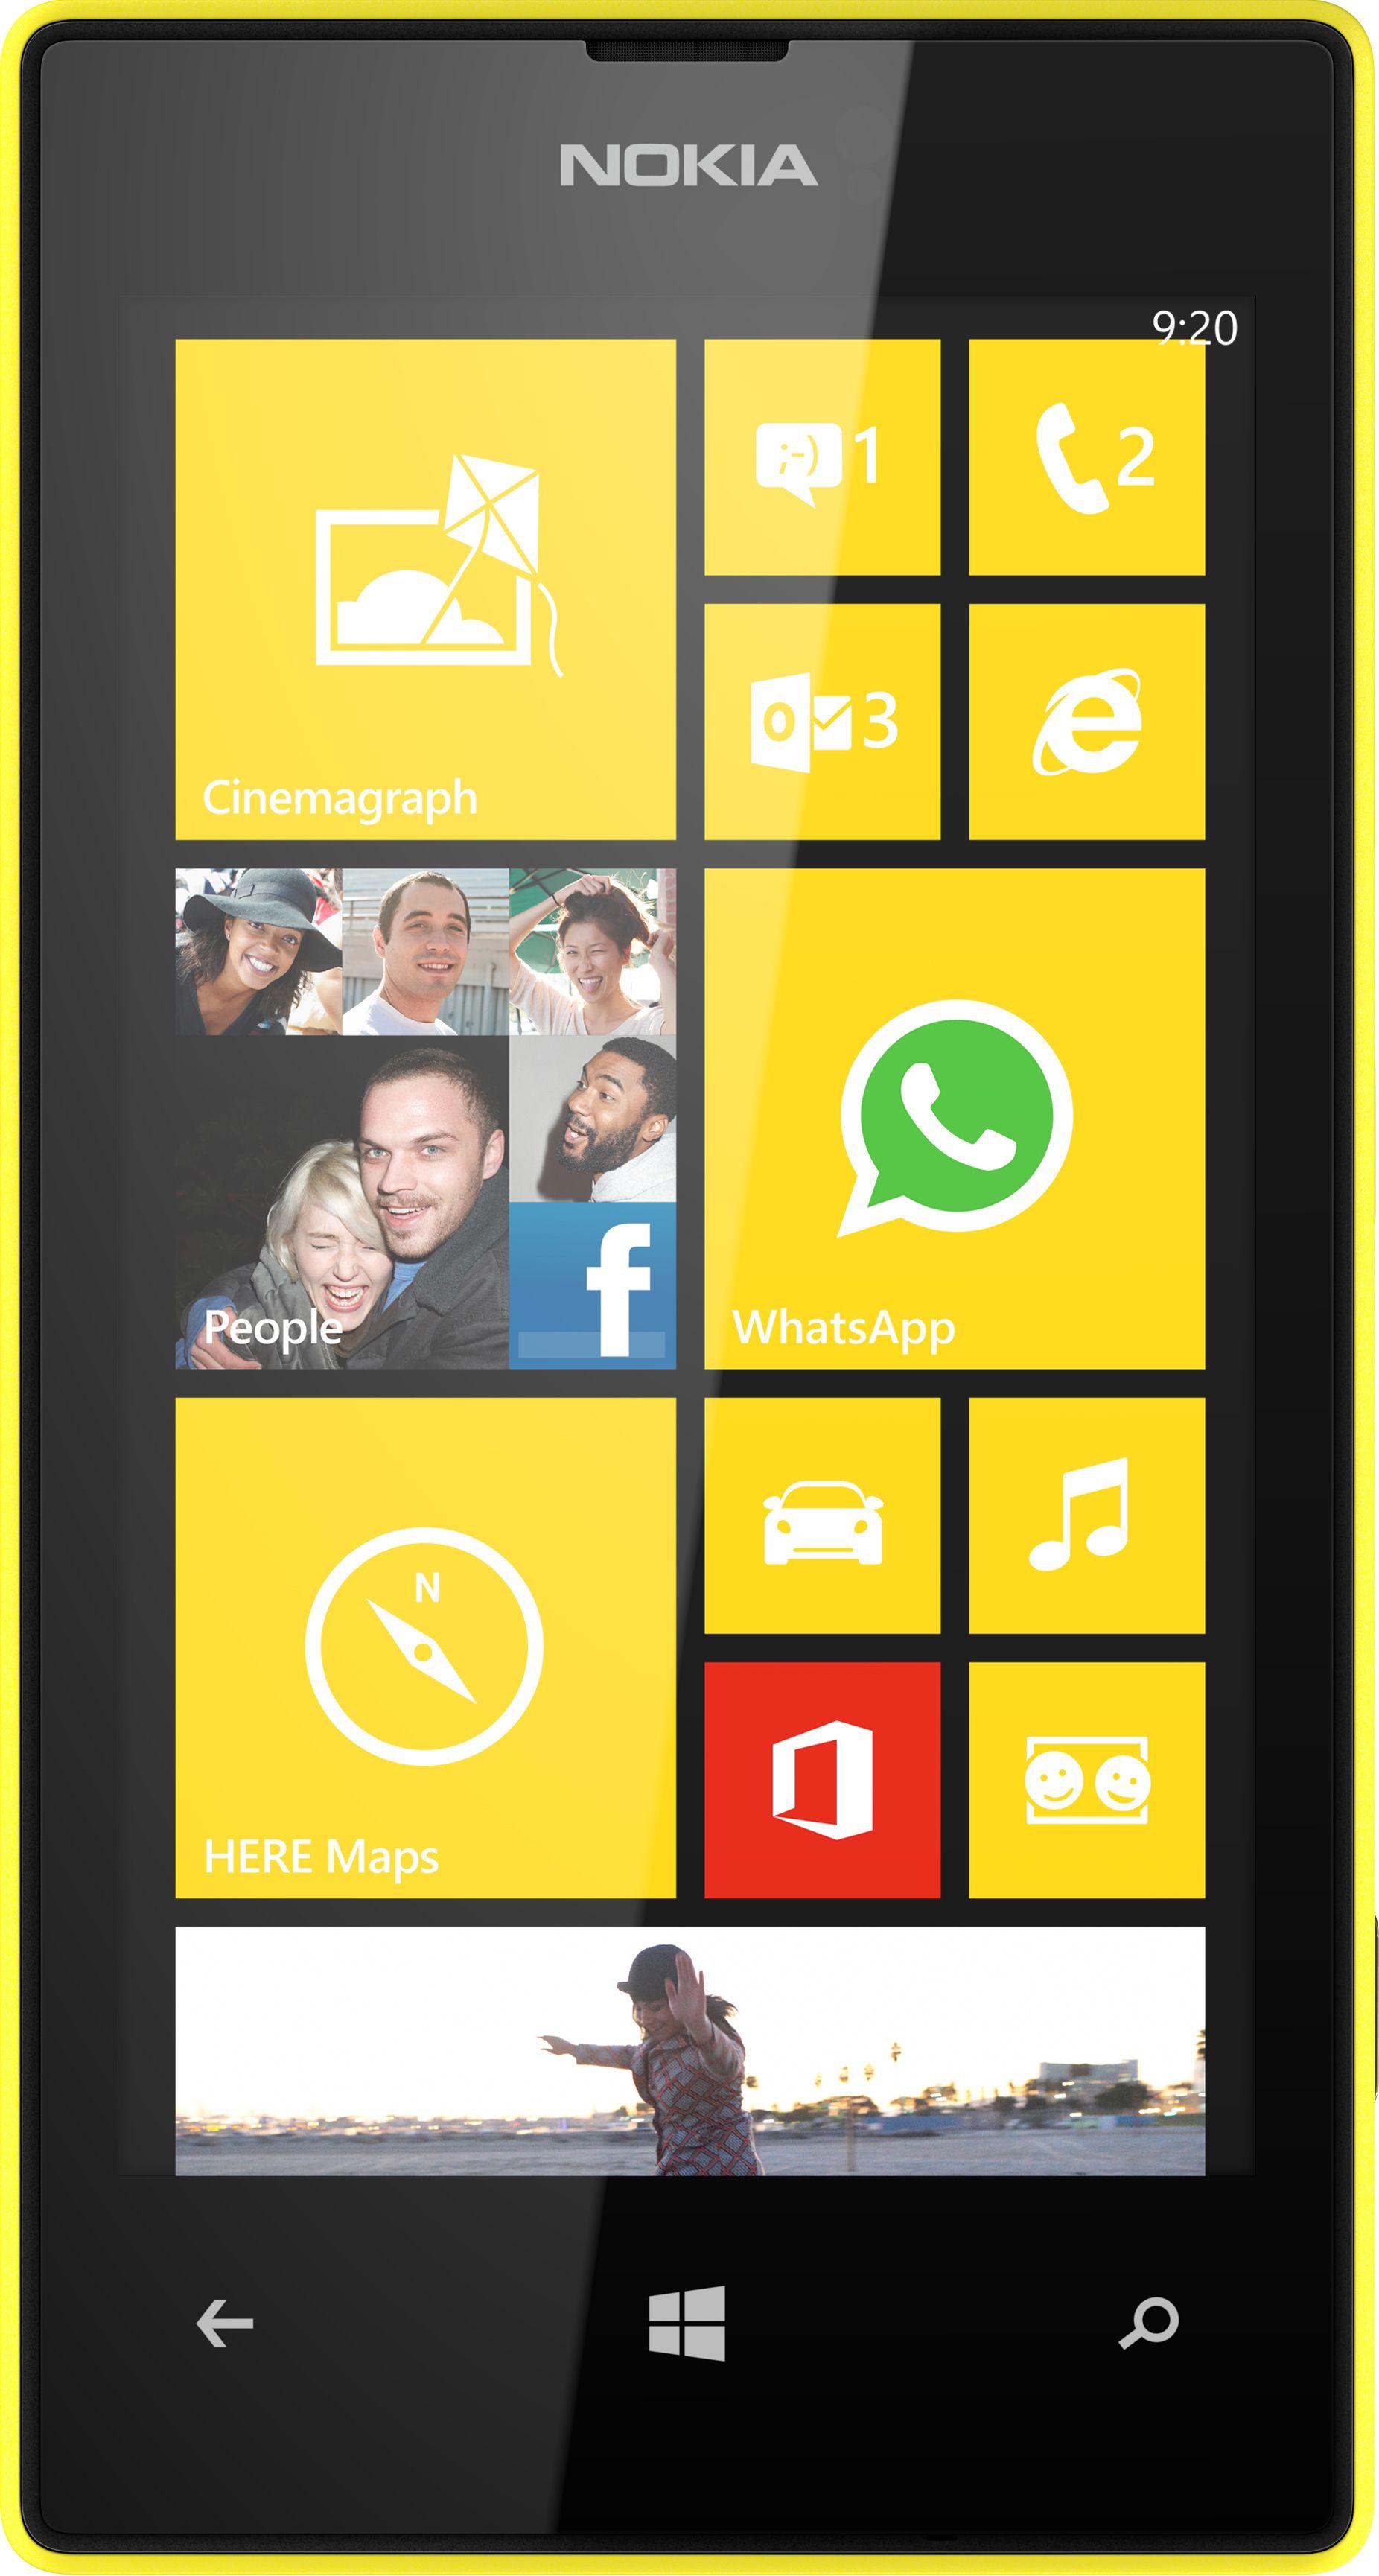 Nokia Lumia 610 Qualcomm driver for Flashing firmware